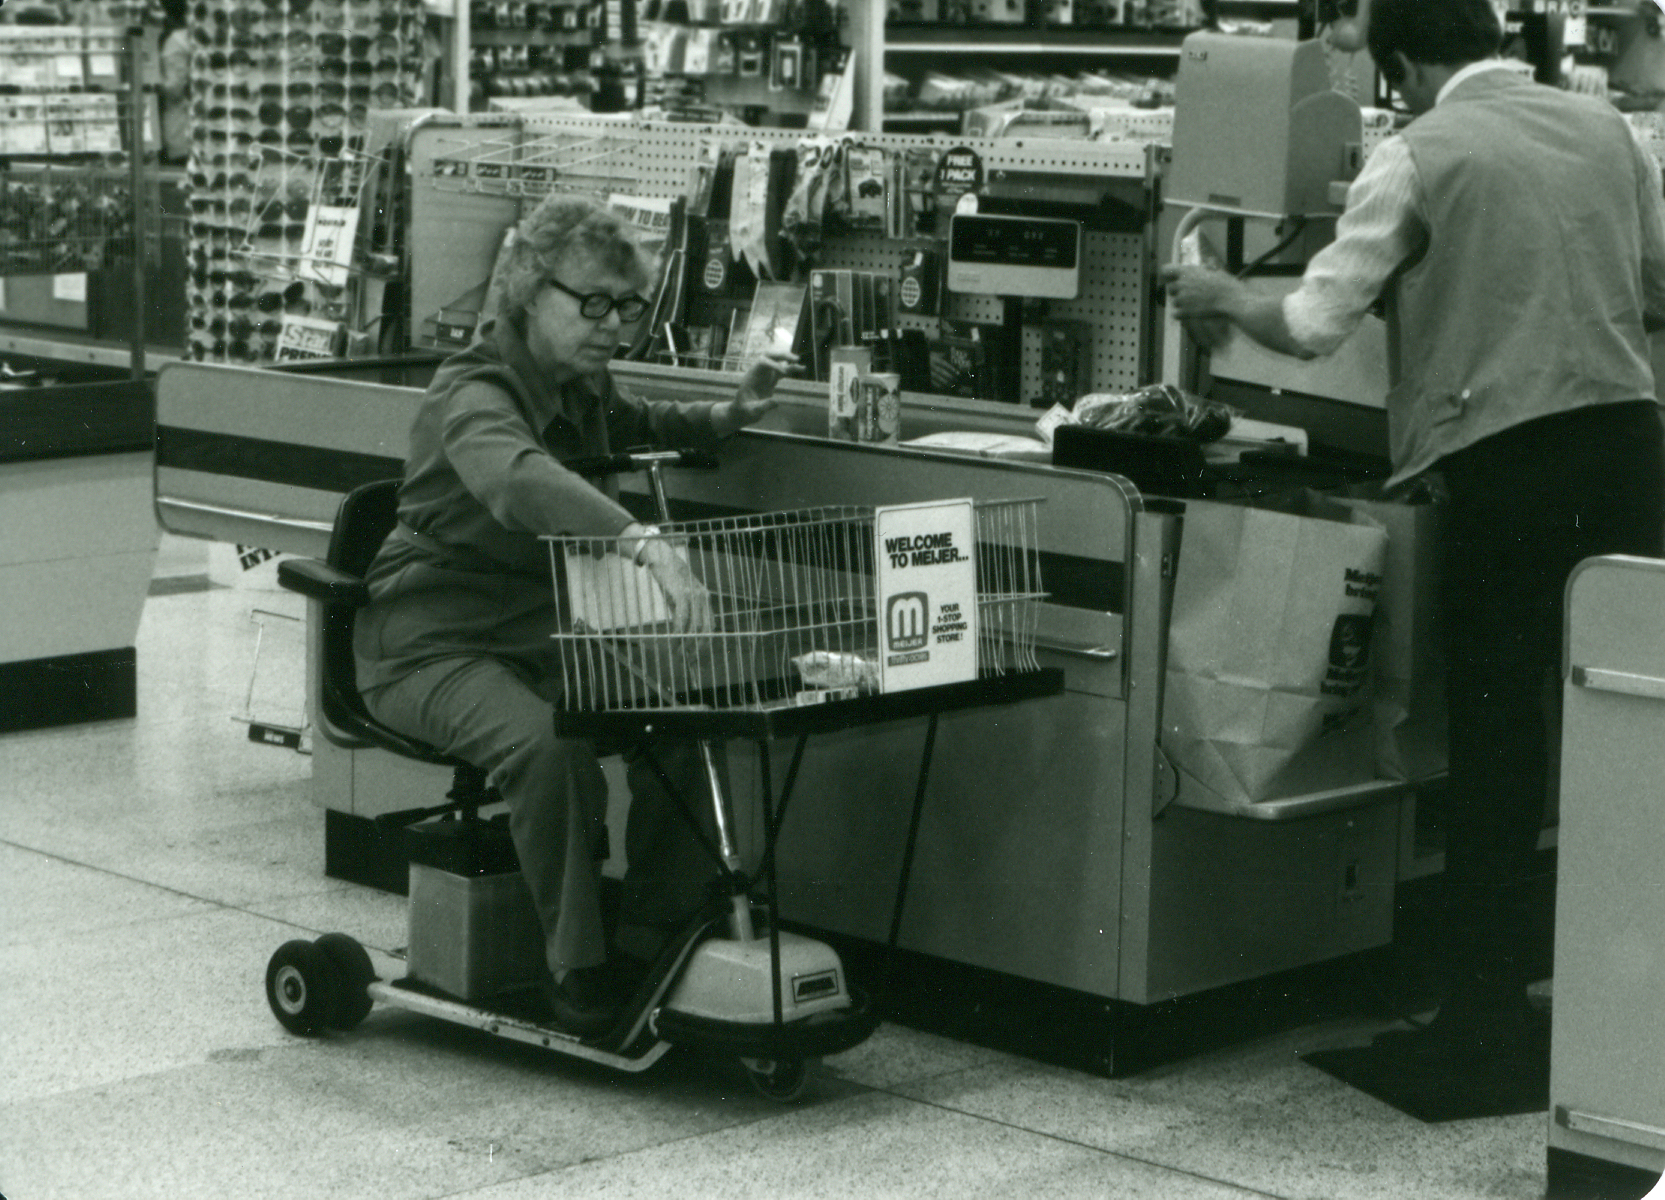 Amigo Motorized Shopping Carts-Mrs. David Klein, 19800001.jpg